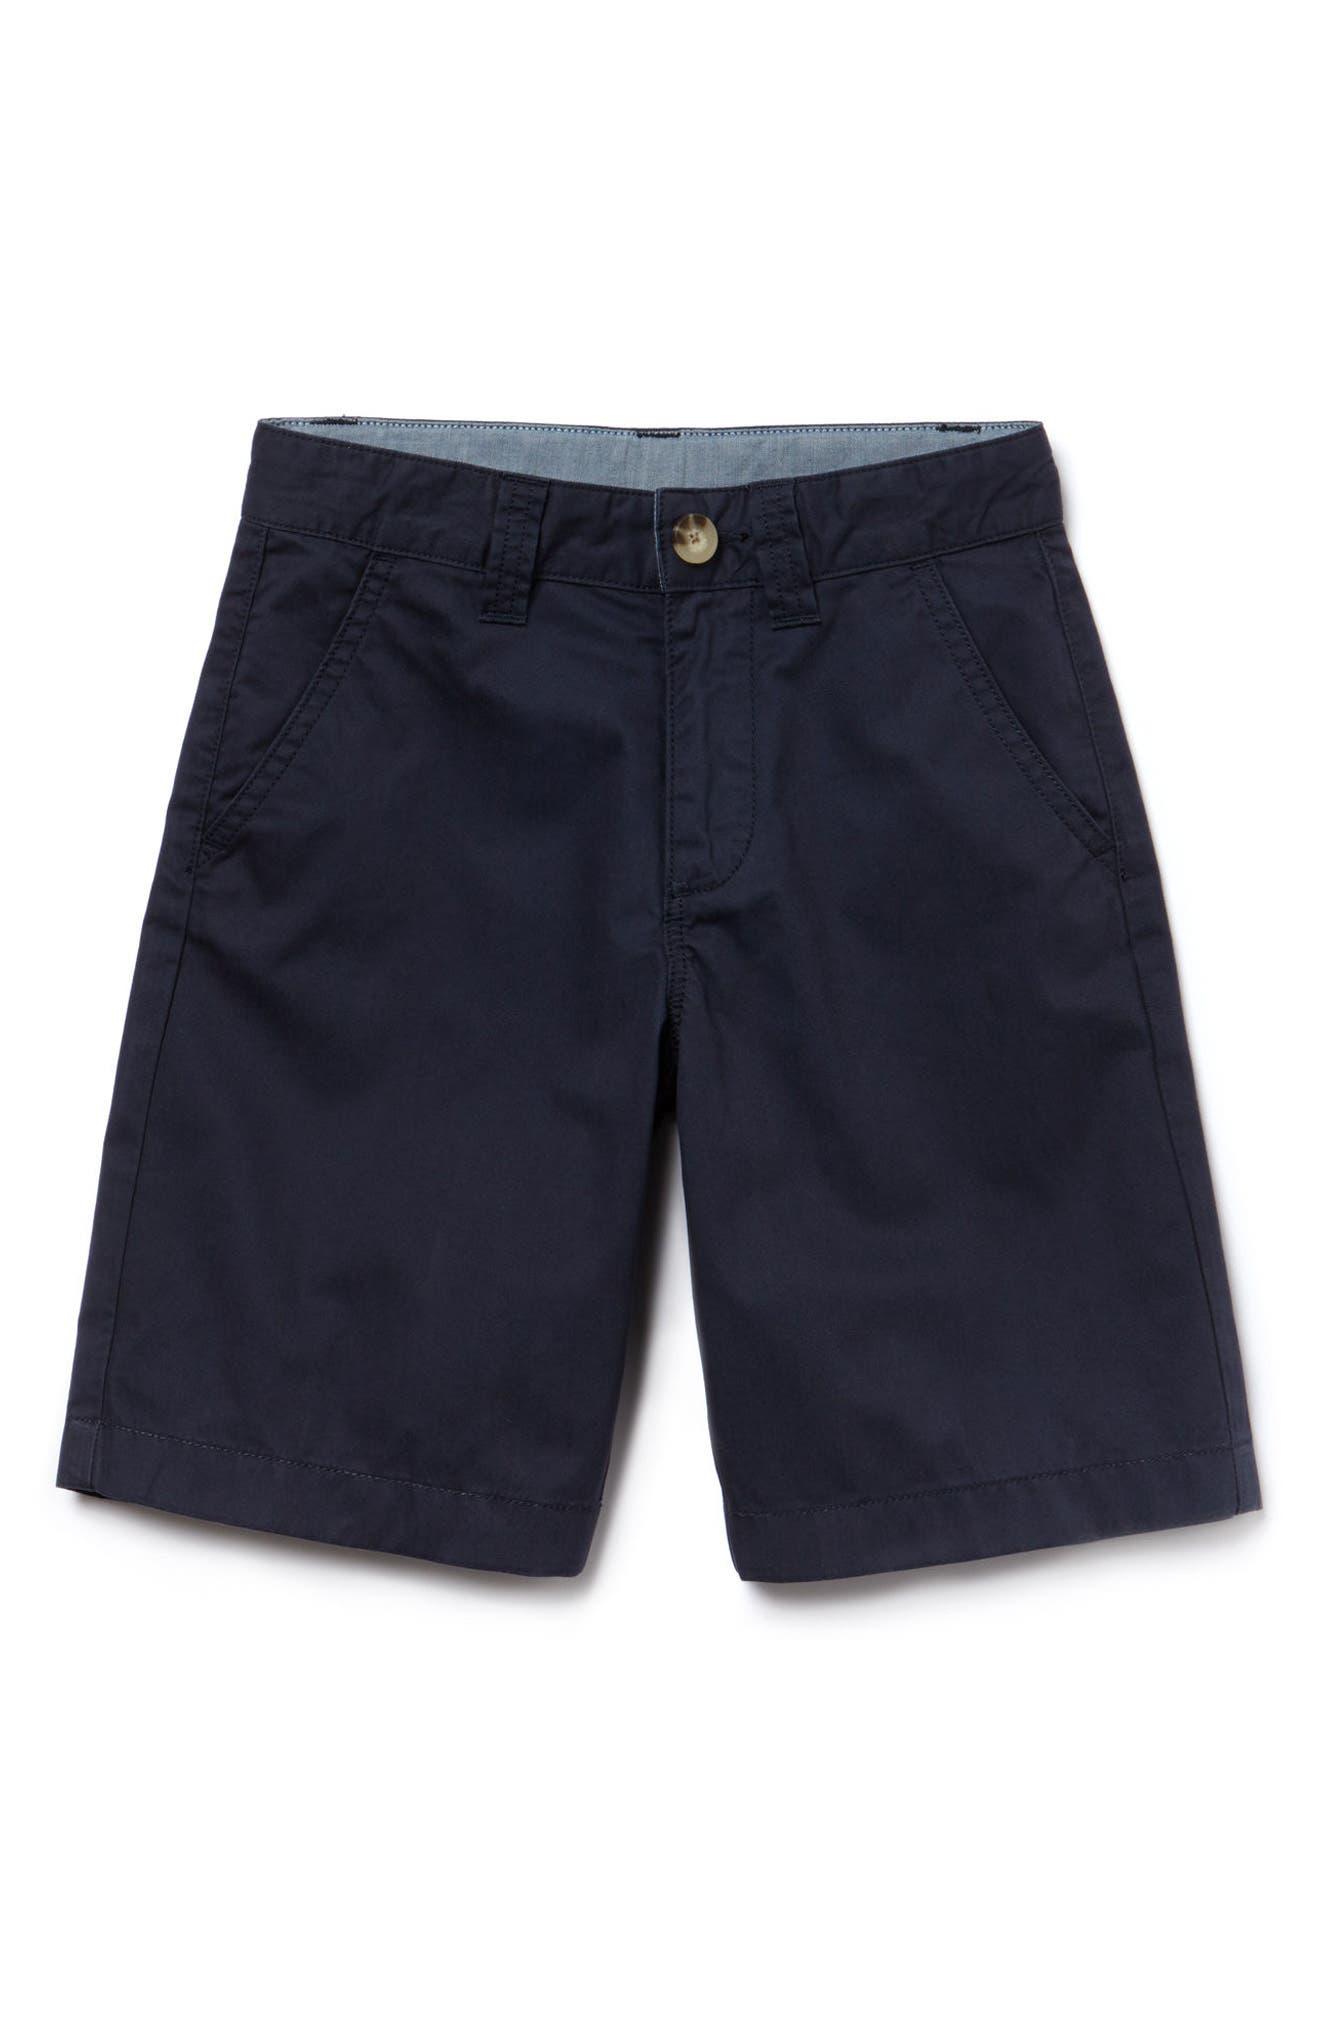 Classic Bermuda Shorts,                         Main,                         color, Navy Blue